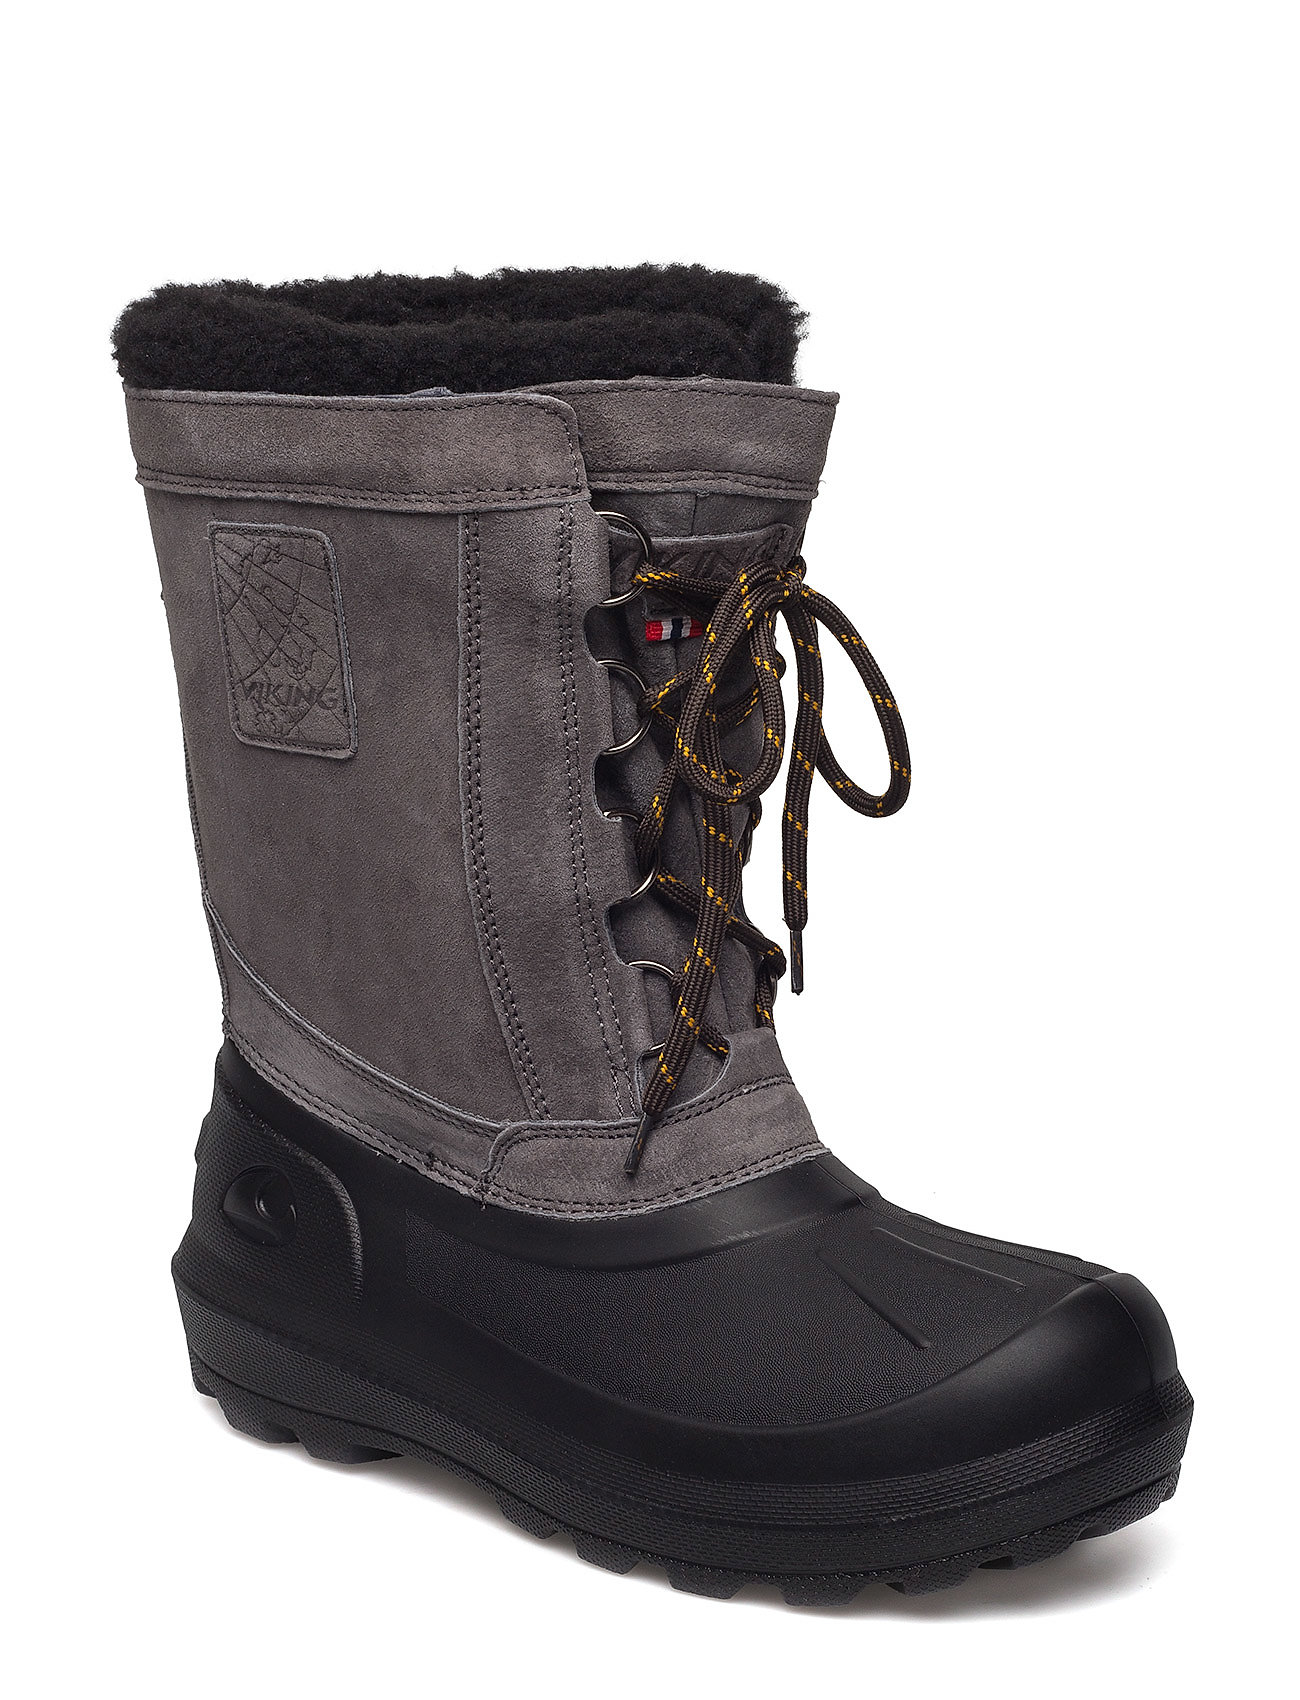 Svartisen (Charcoal black) (71.50 €) - Viking -  5145746e39